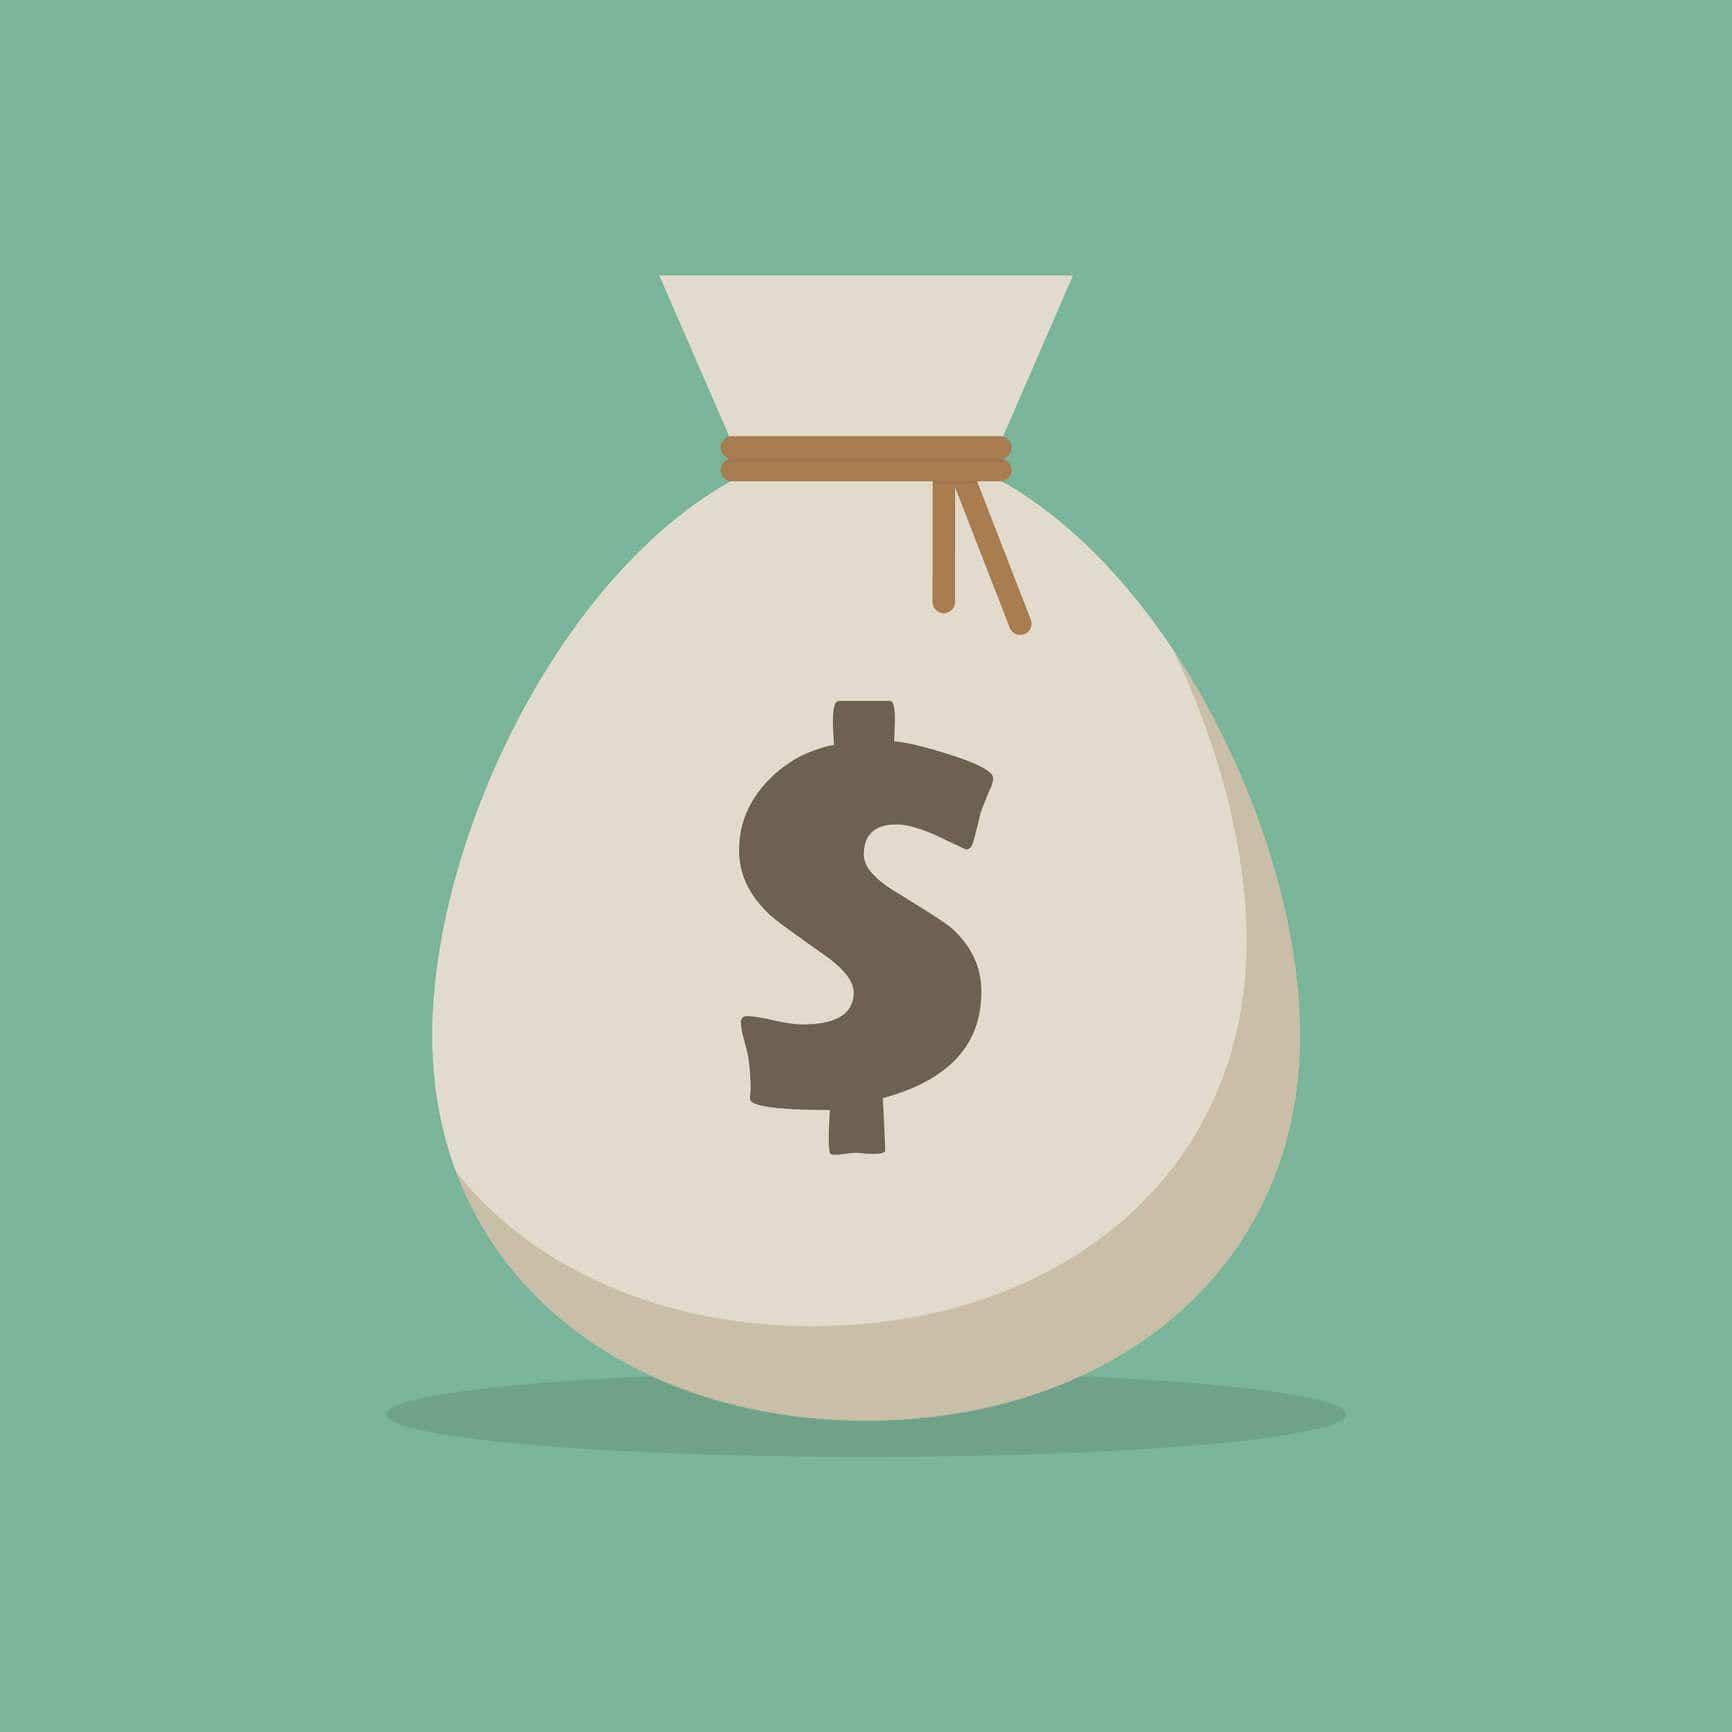 sole proprietor advantage more money for you